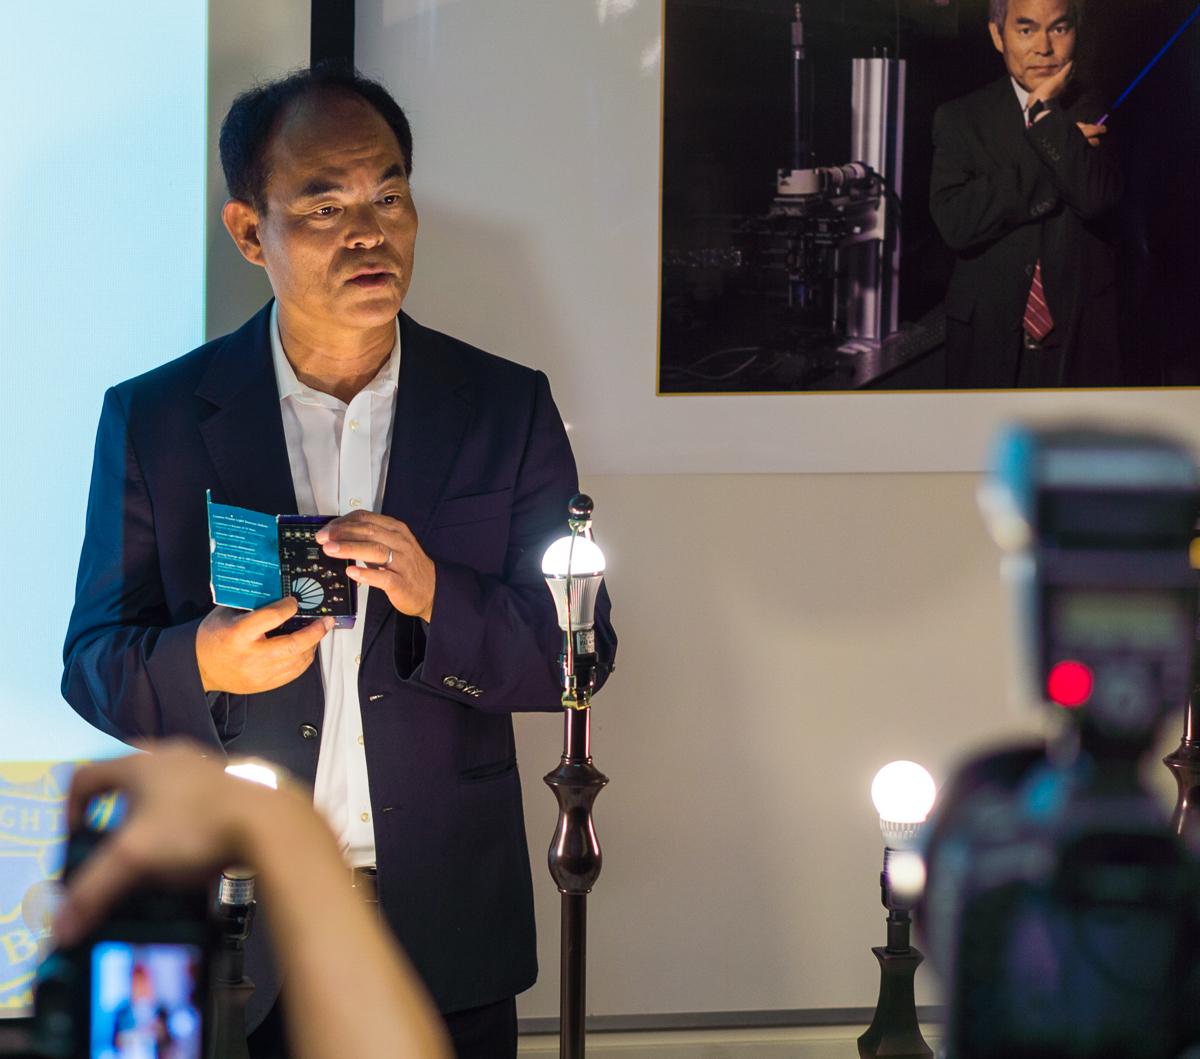 Shuji Nakamura Nobel Prize Winner_10.07.2014_John Clow-1